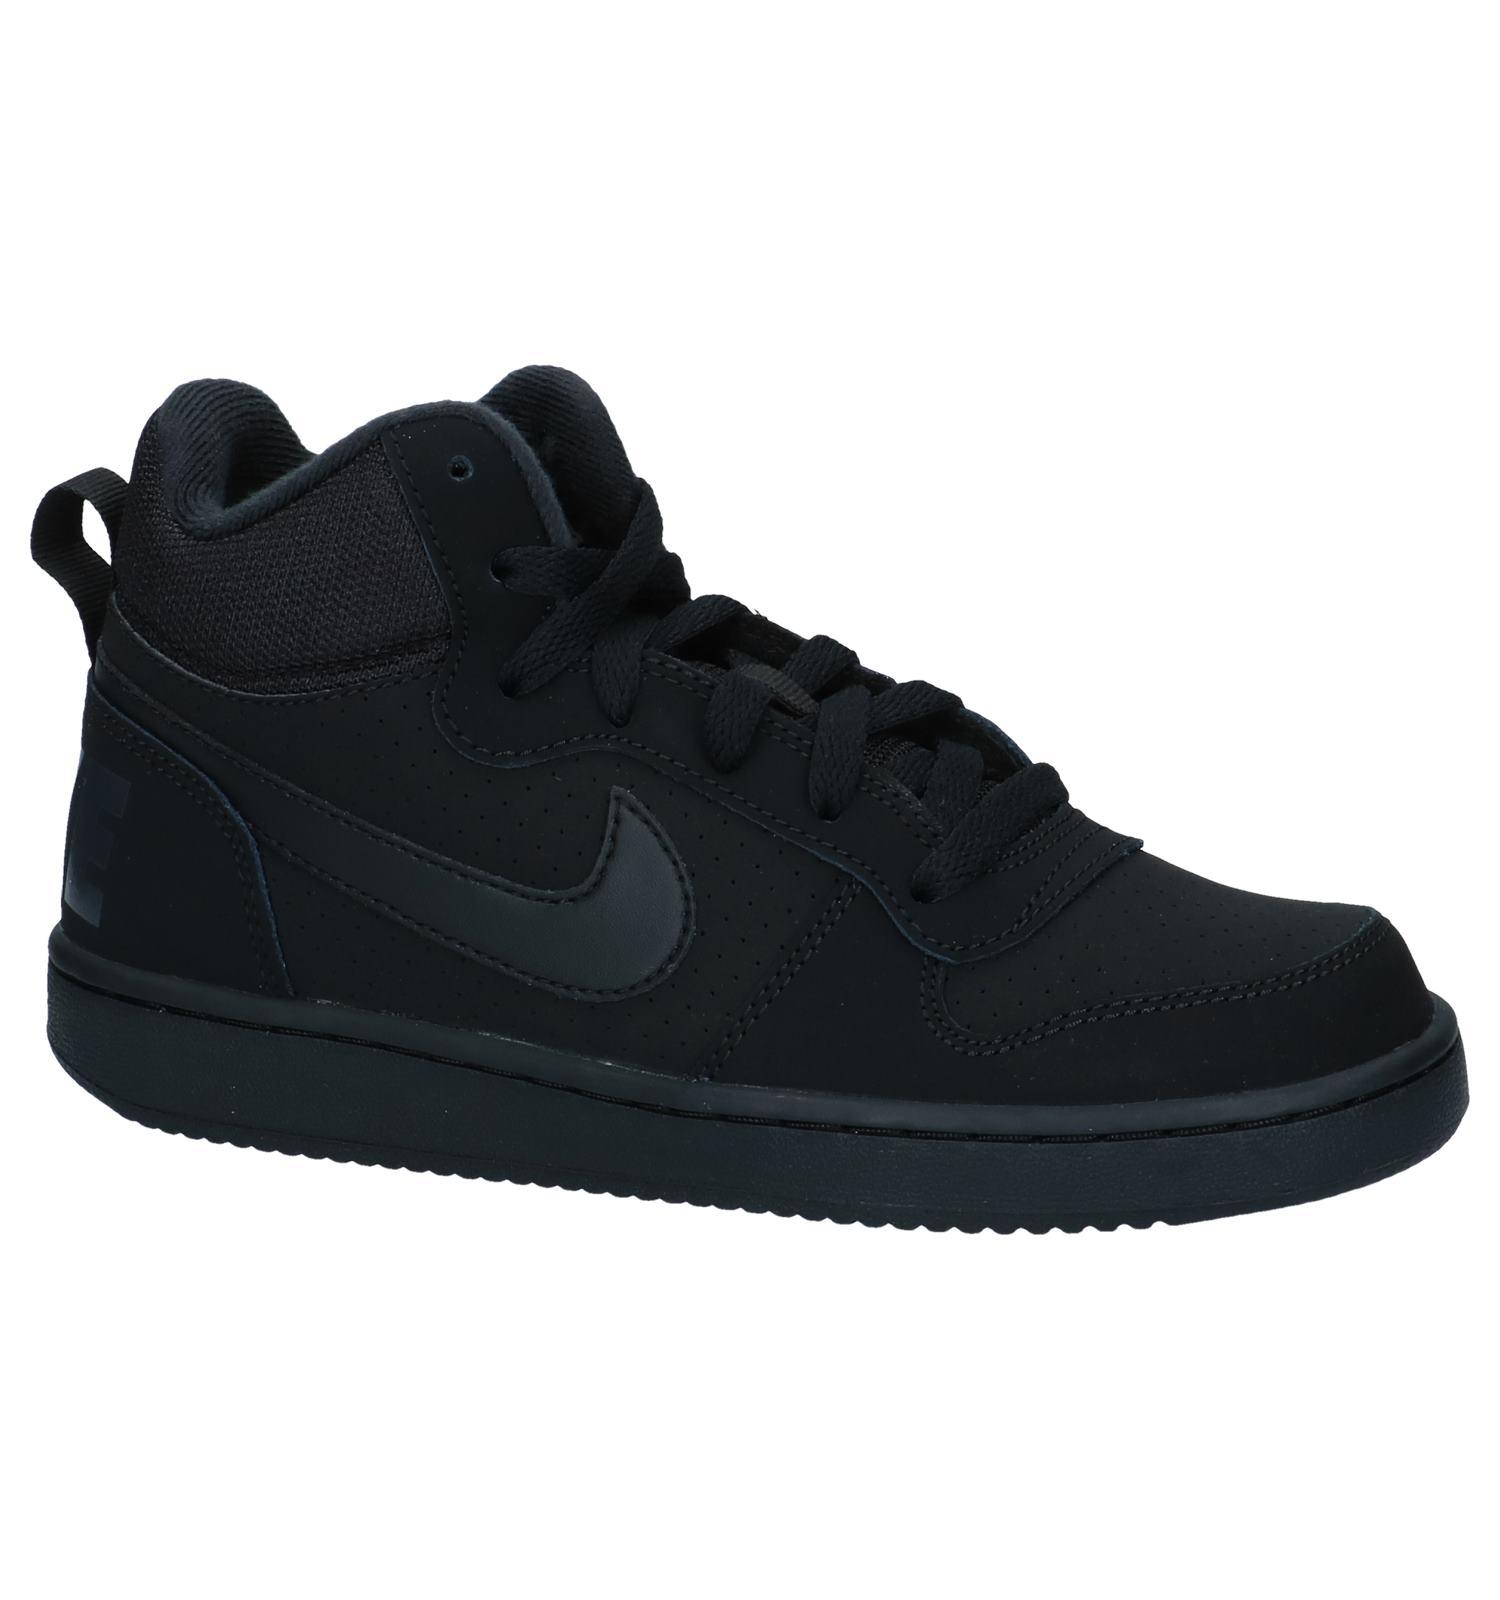 32a31723499 Zwarte Sneakers Nike Court Borough Mid | TORFS.BE | Gratis verzend en retour